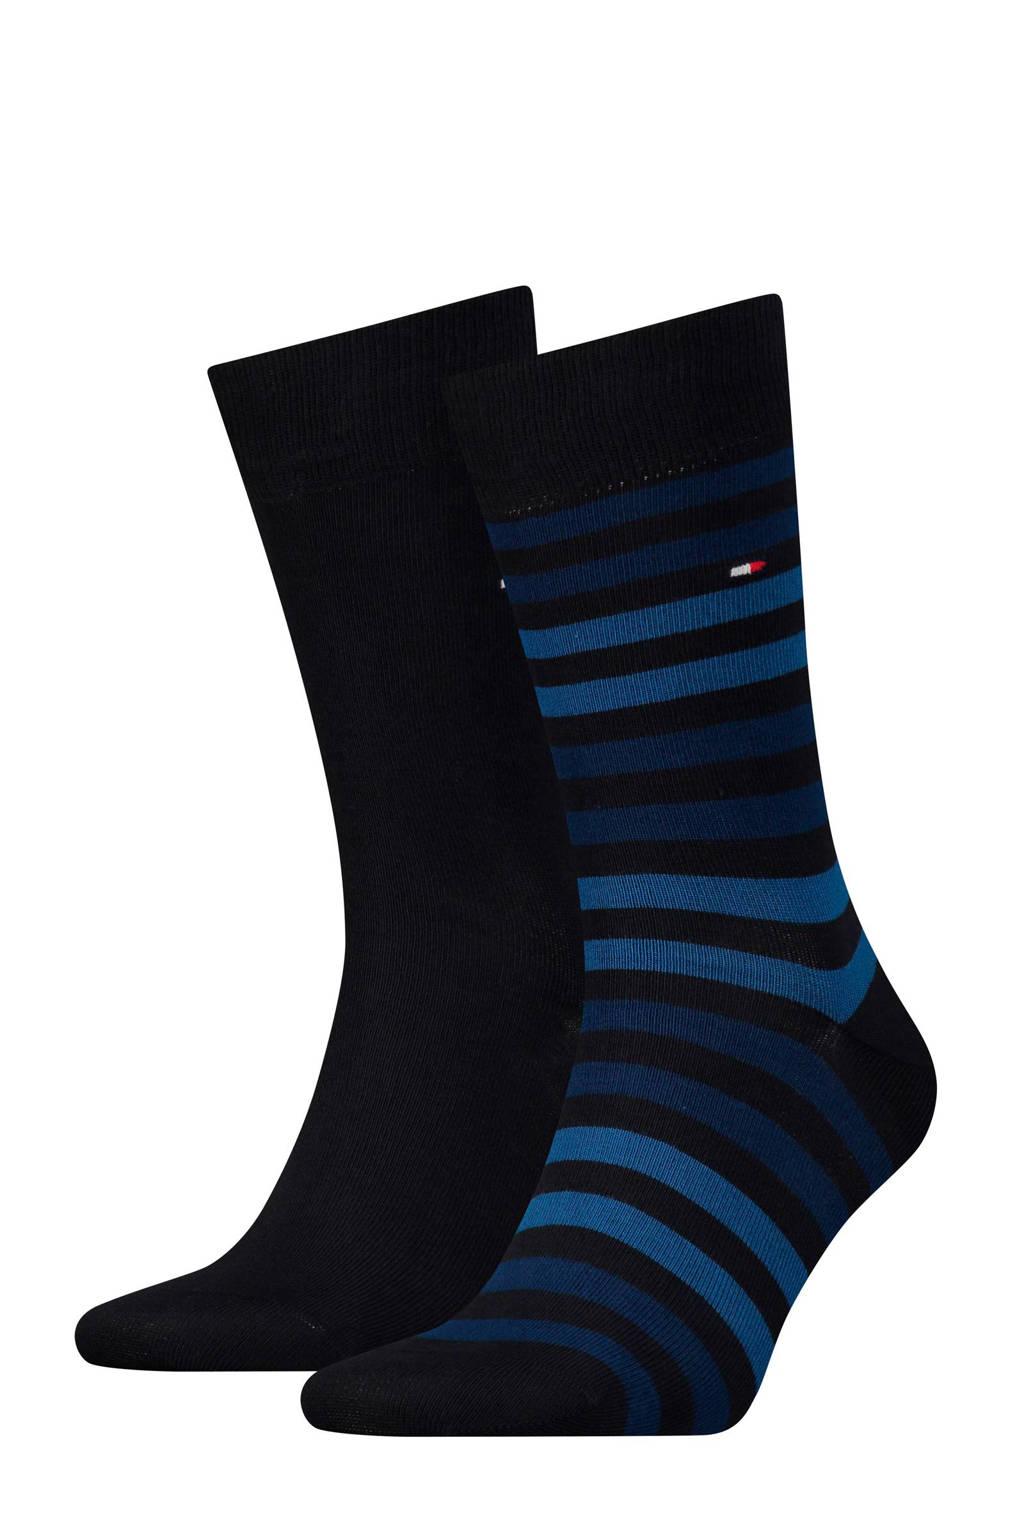 Tommy Hilfiger sokken (2 paar), Navy